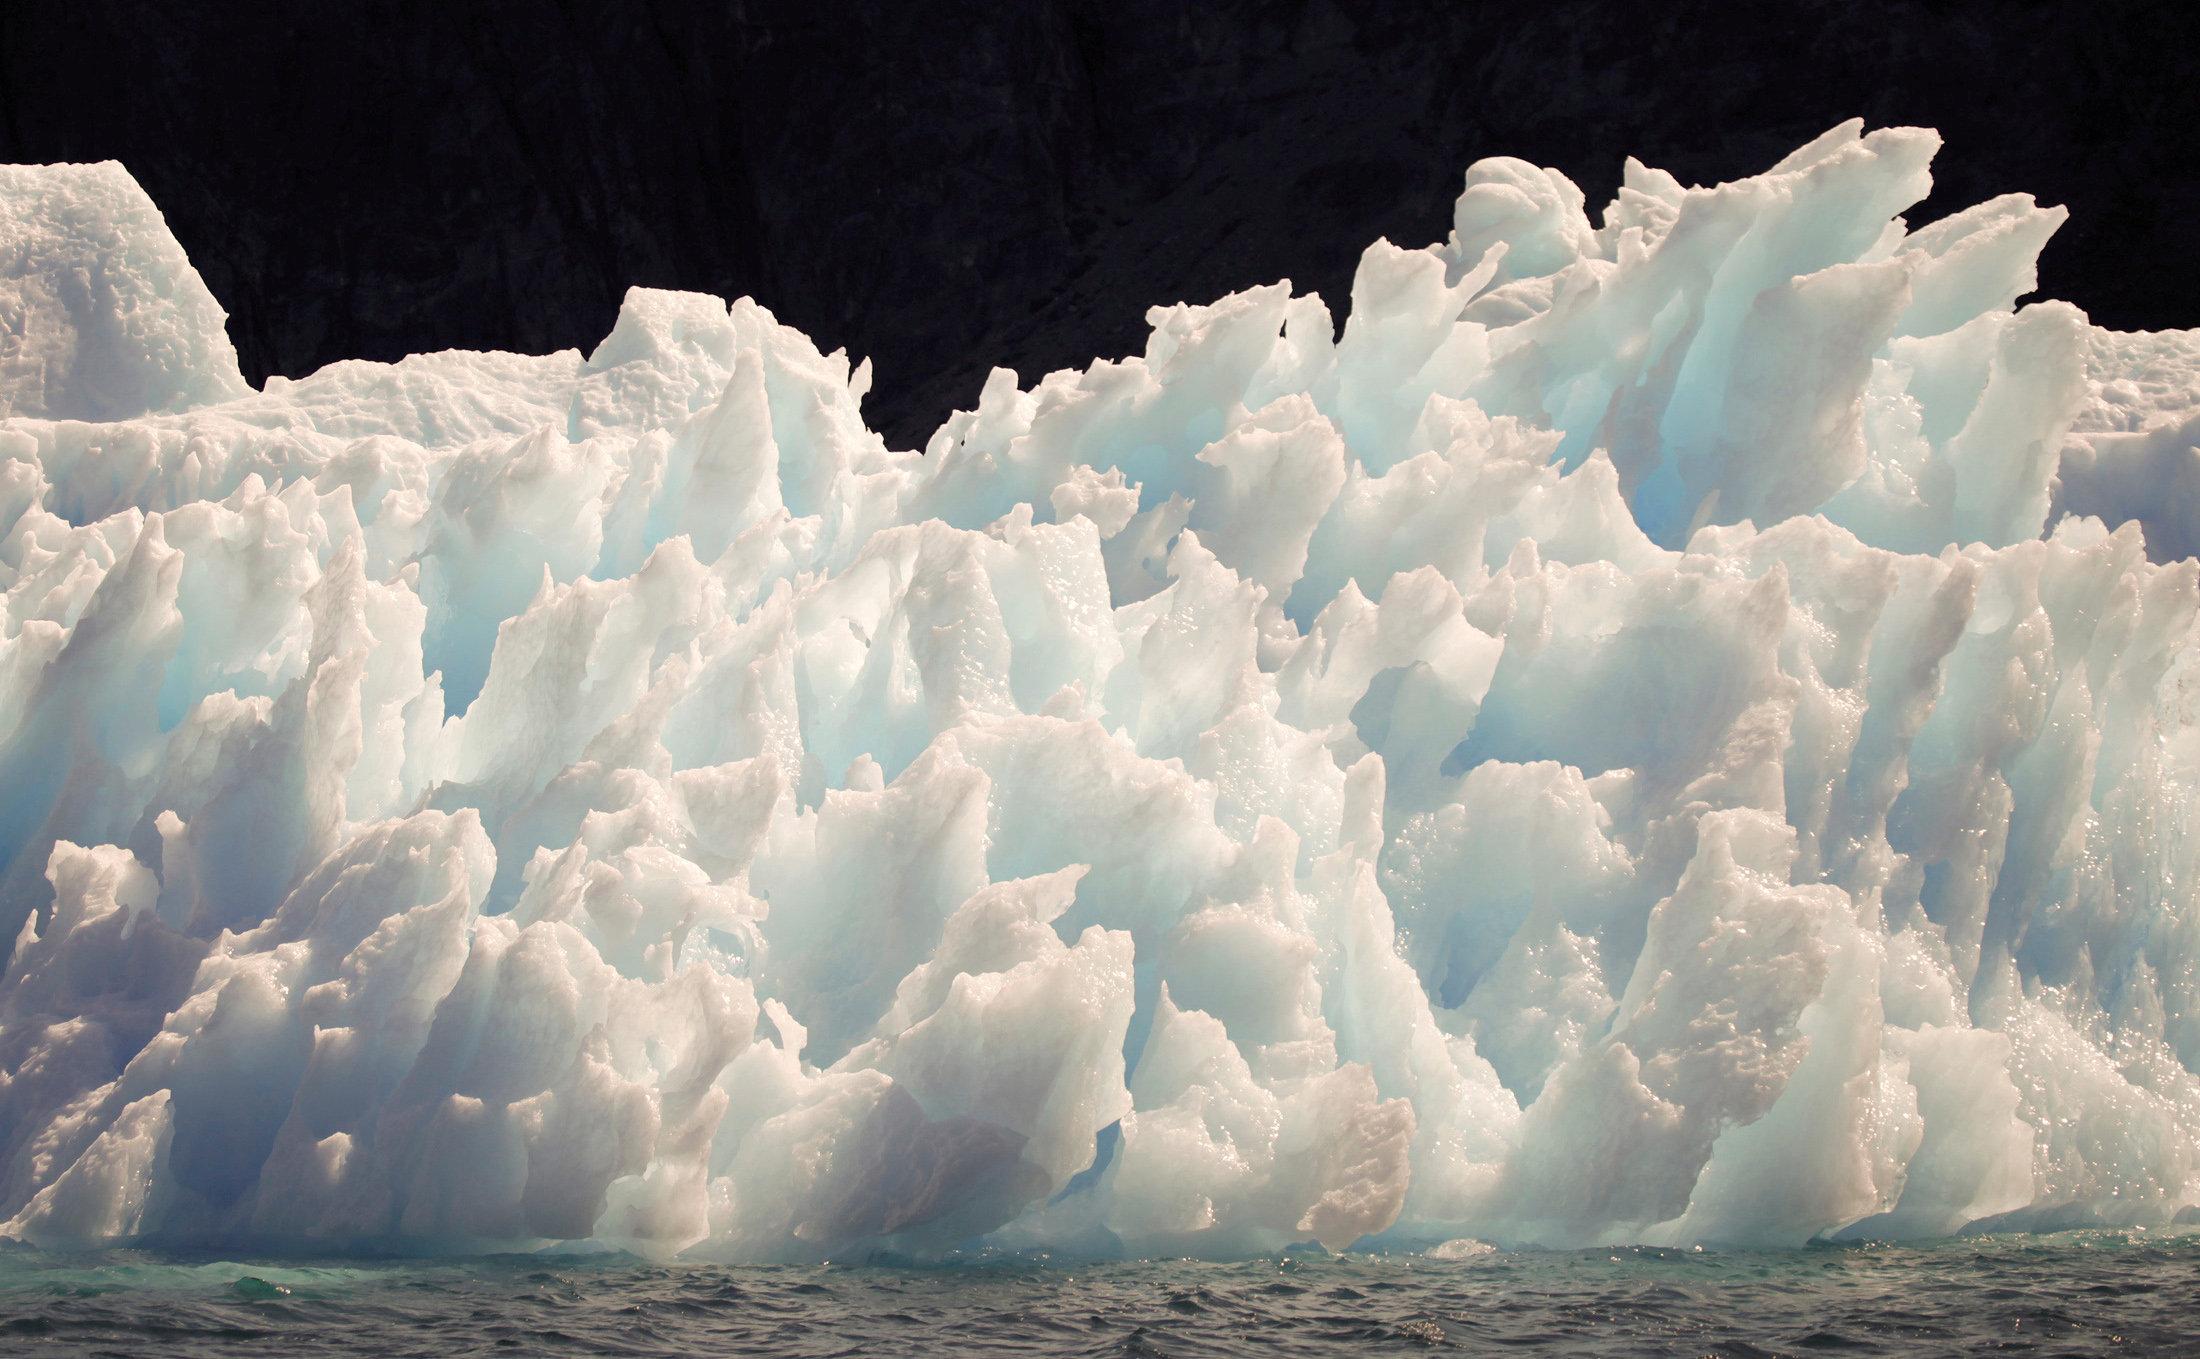 Arctic thaw quickening threatens trillion-dollar costs, says report